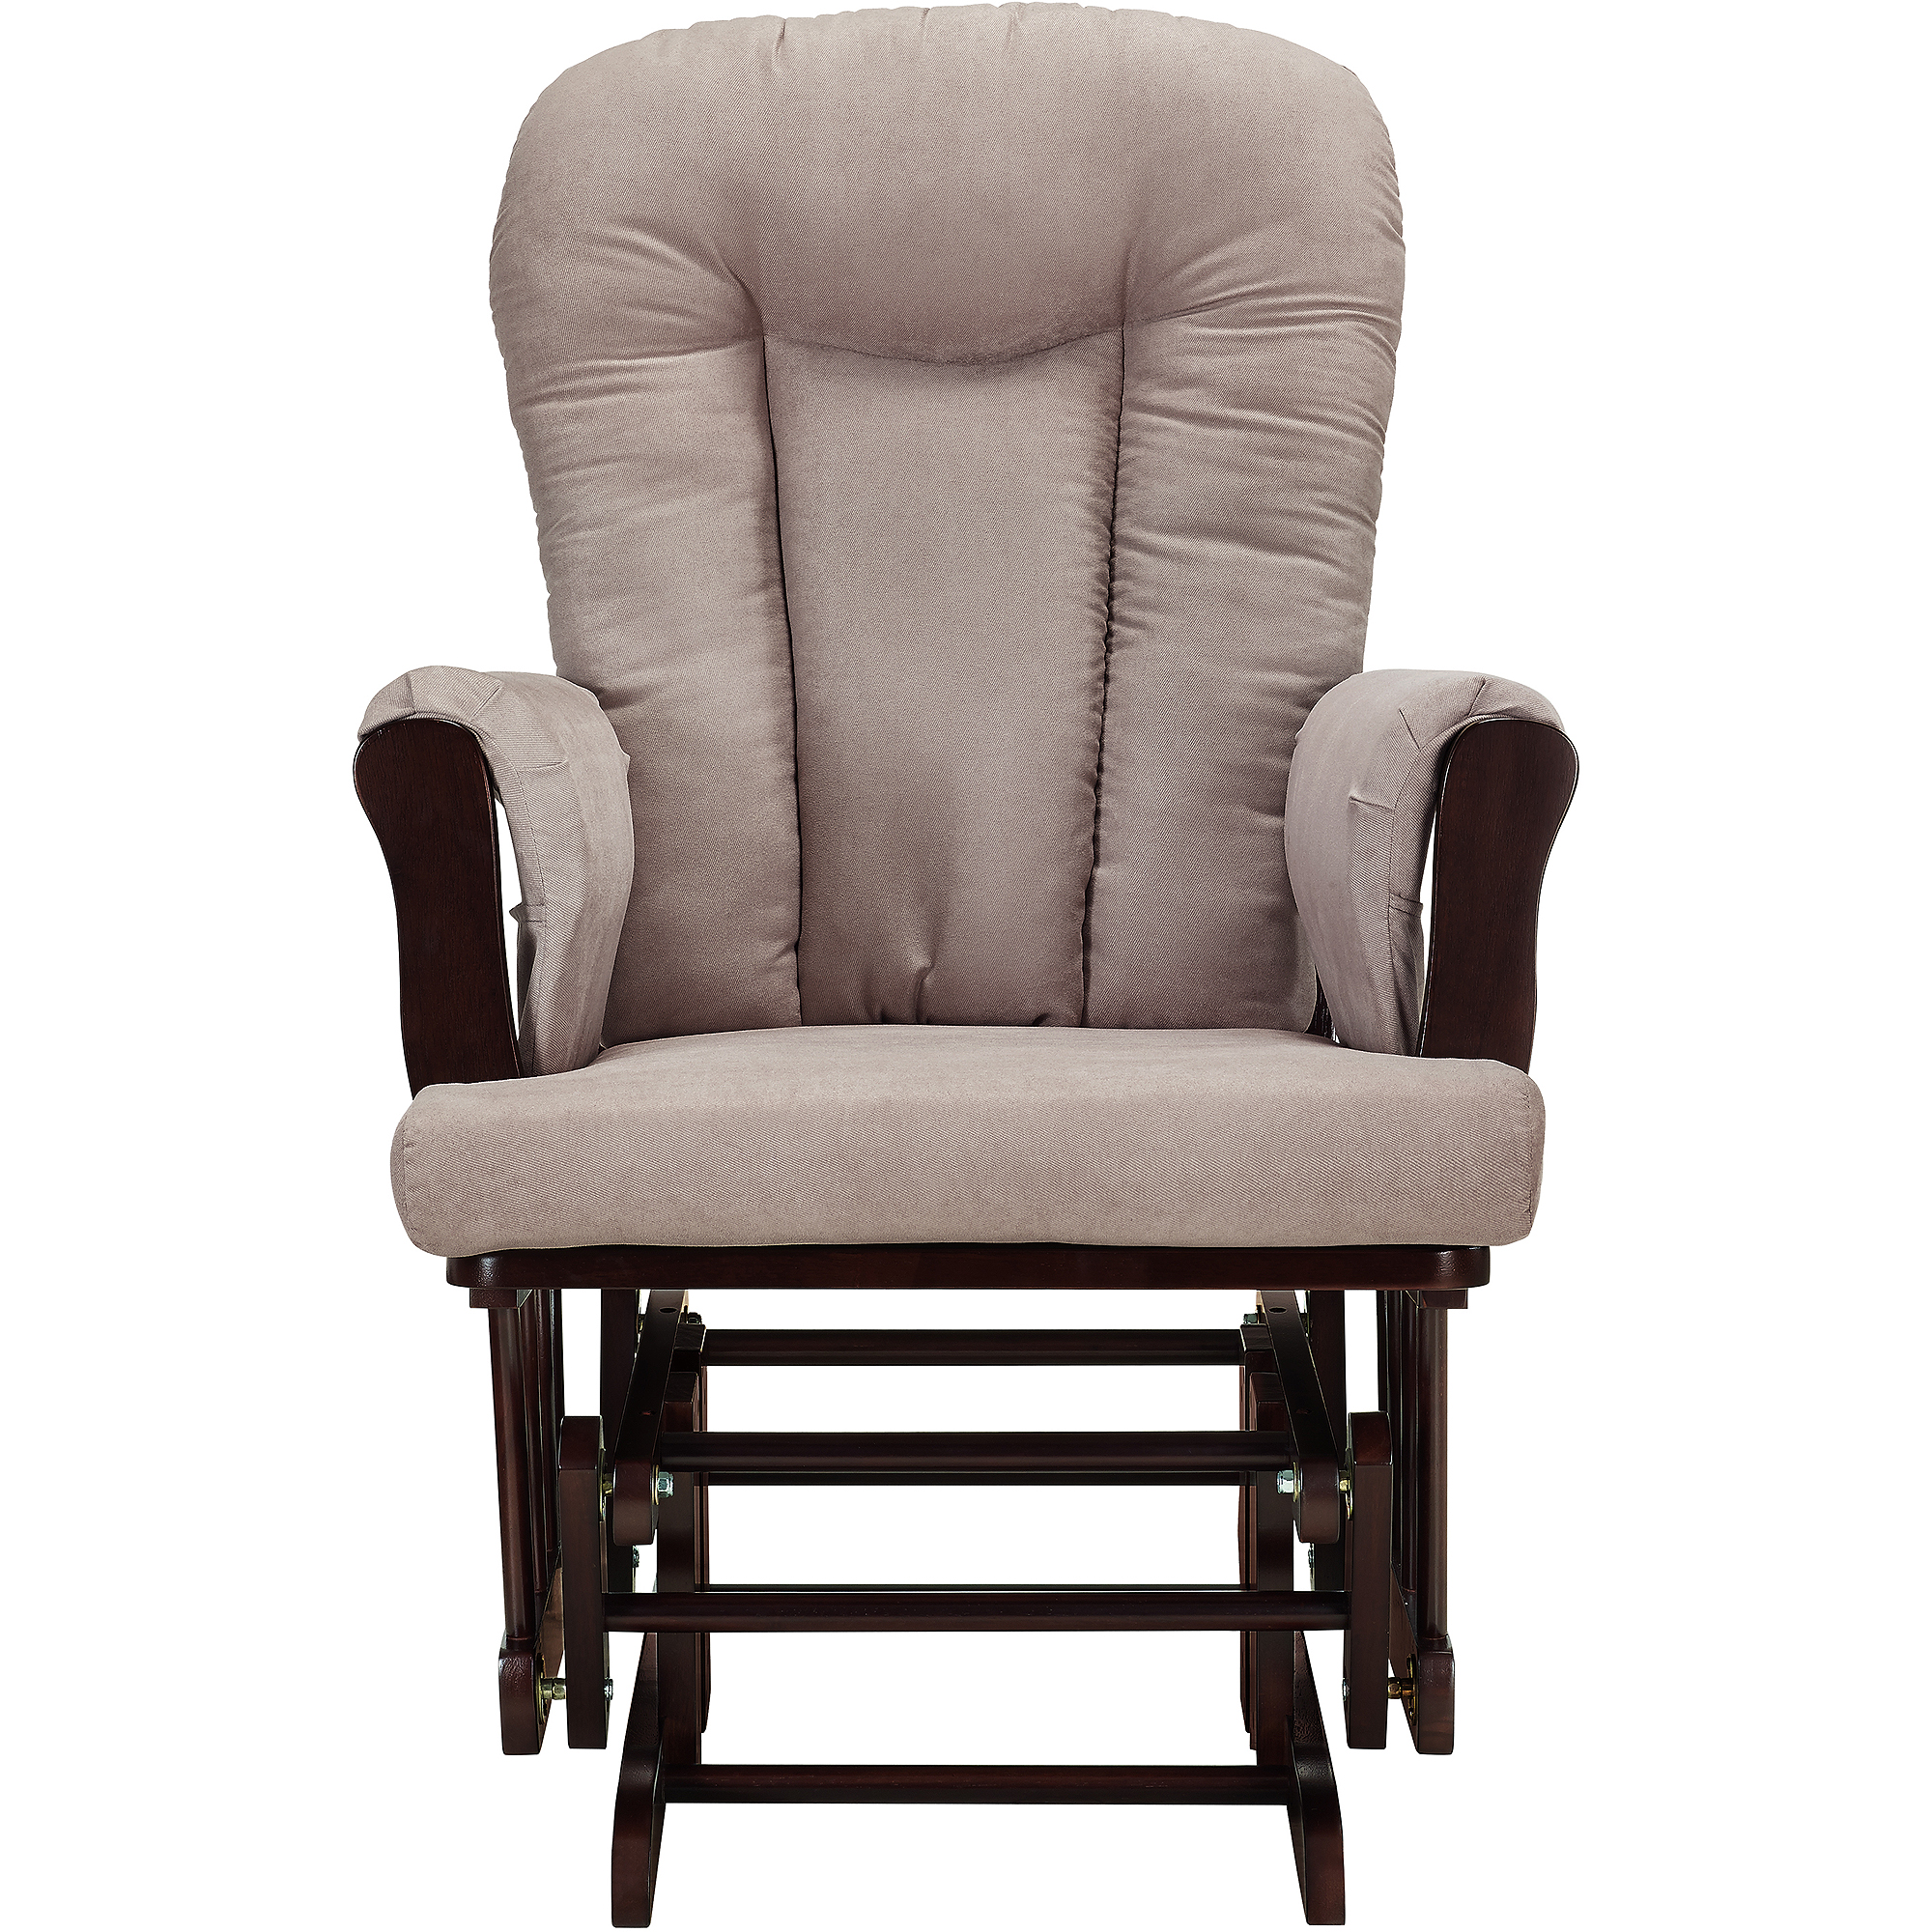 baby relax glider rocker and ottoman espresso with chocolate cushions walmartcom - Glider Rocker Chair